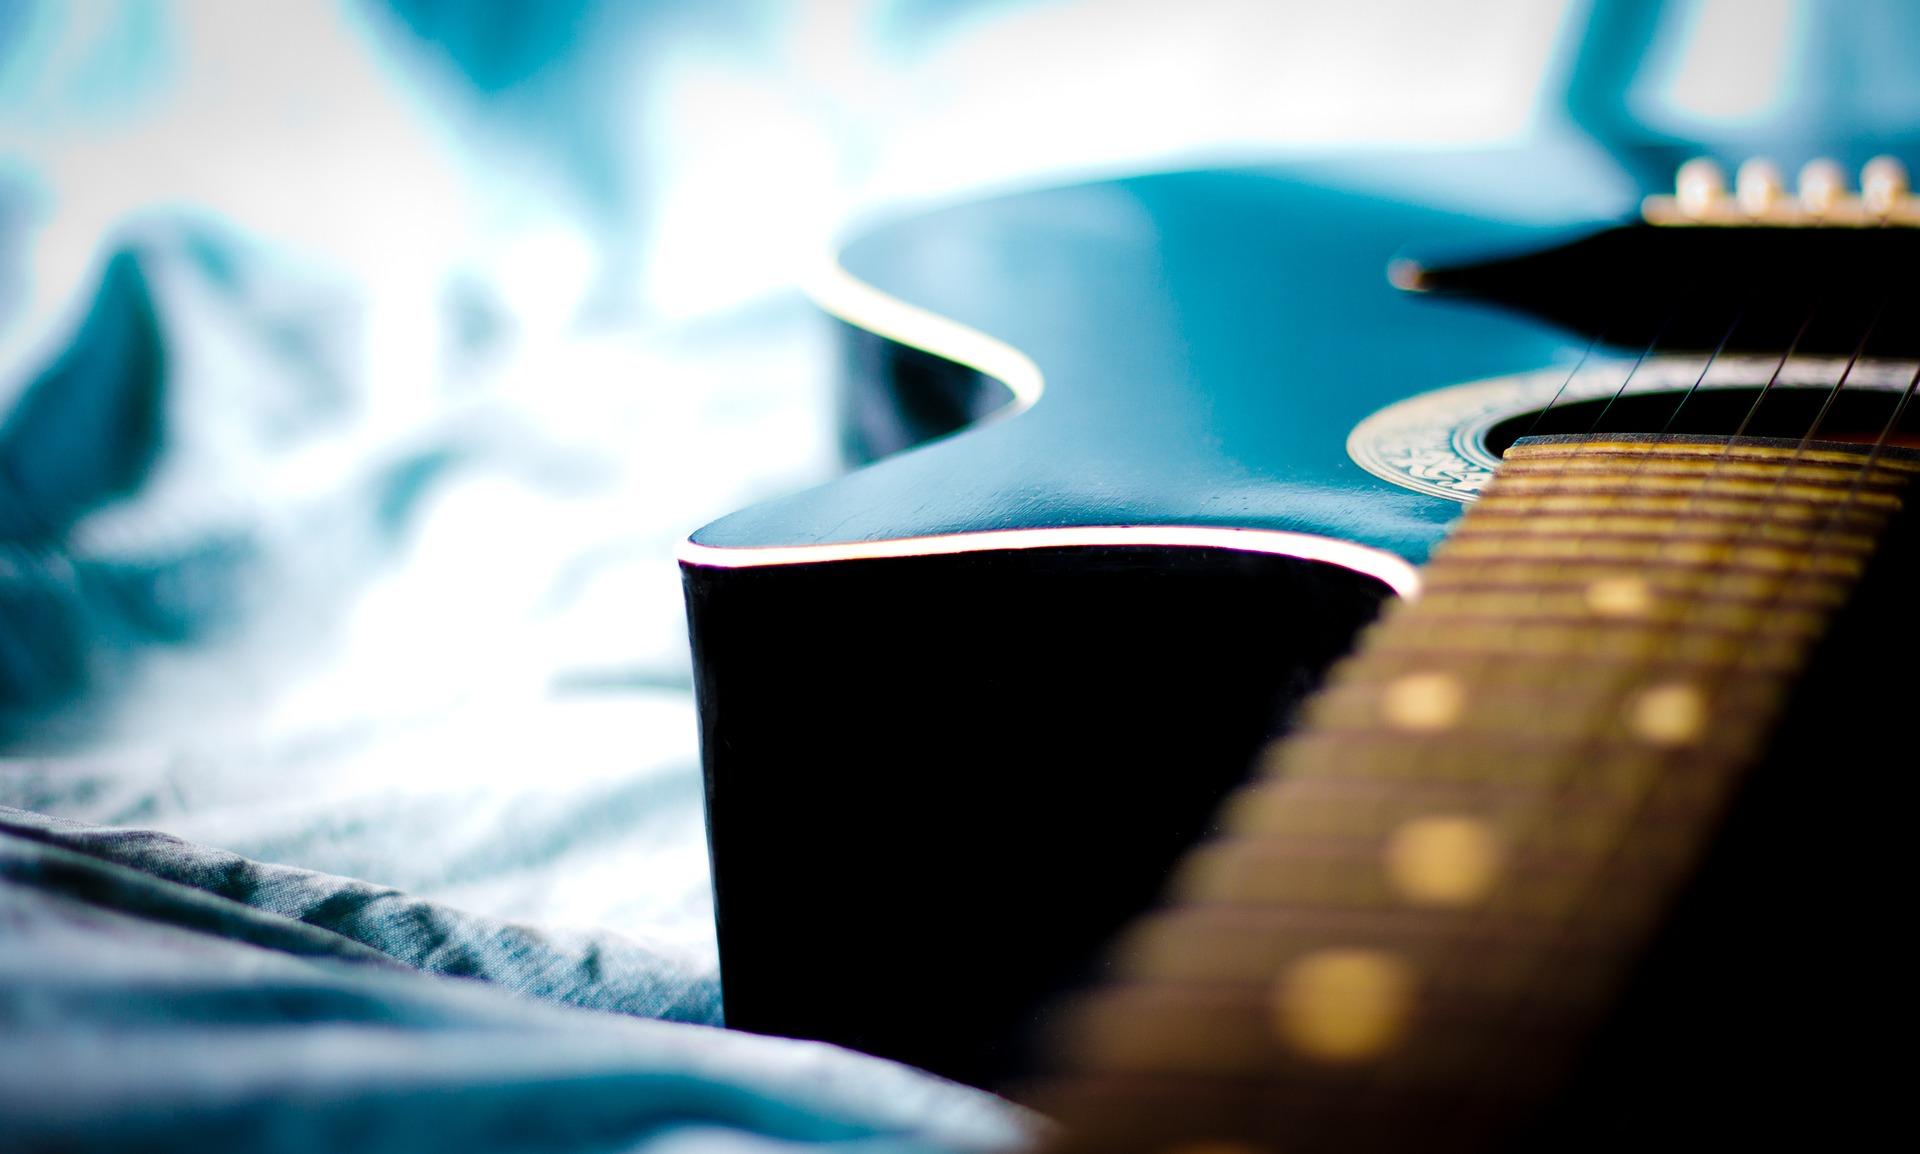 Chitarra, stringhe, canzone, creatività, arte, corda - Sfondi HD - Professor-falken.com